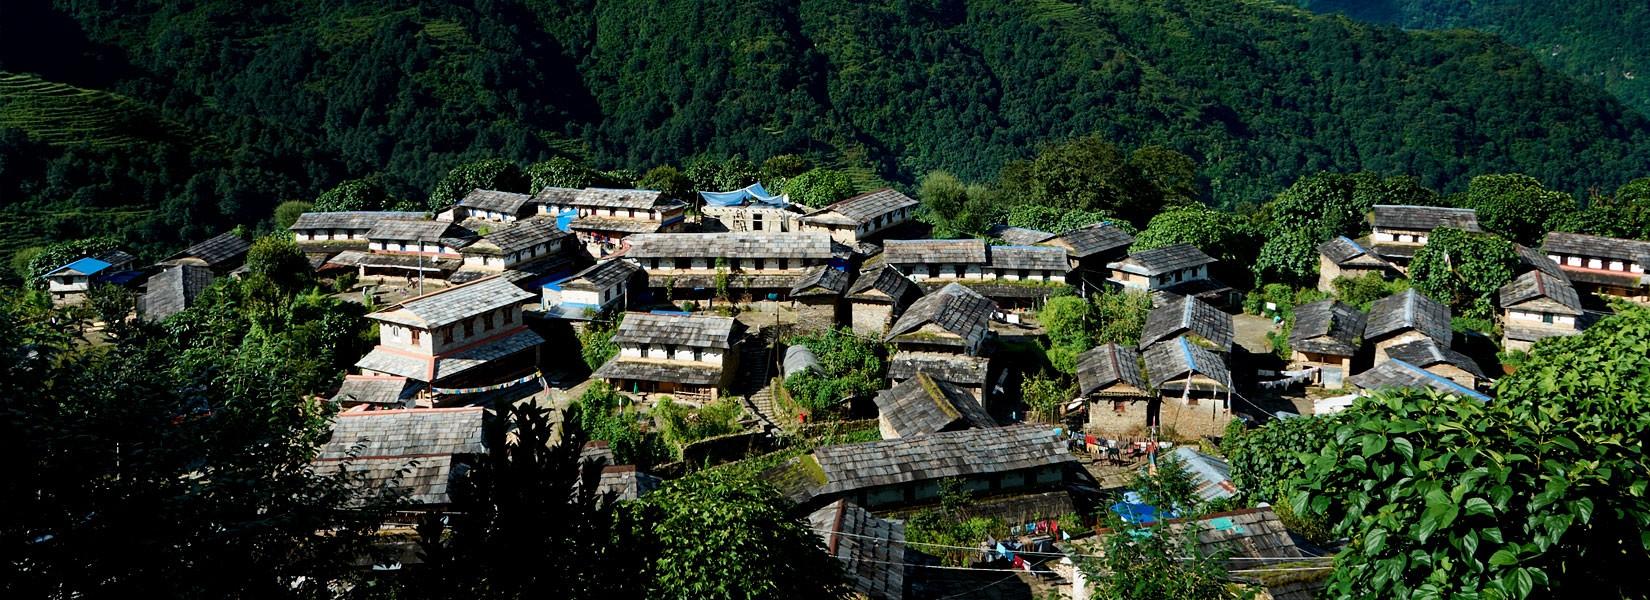 The cultural Village of Ghandruk